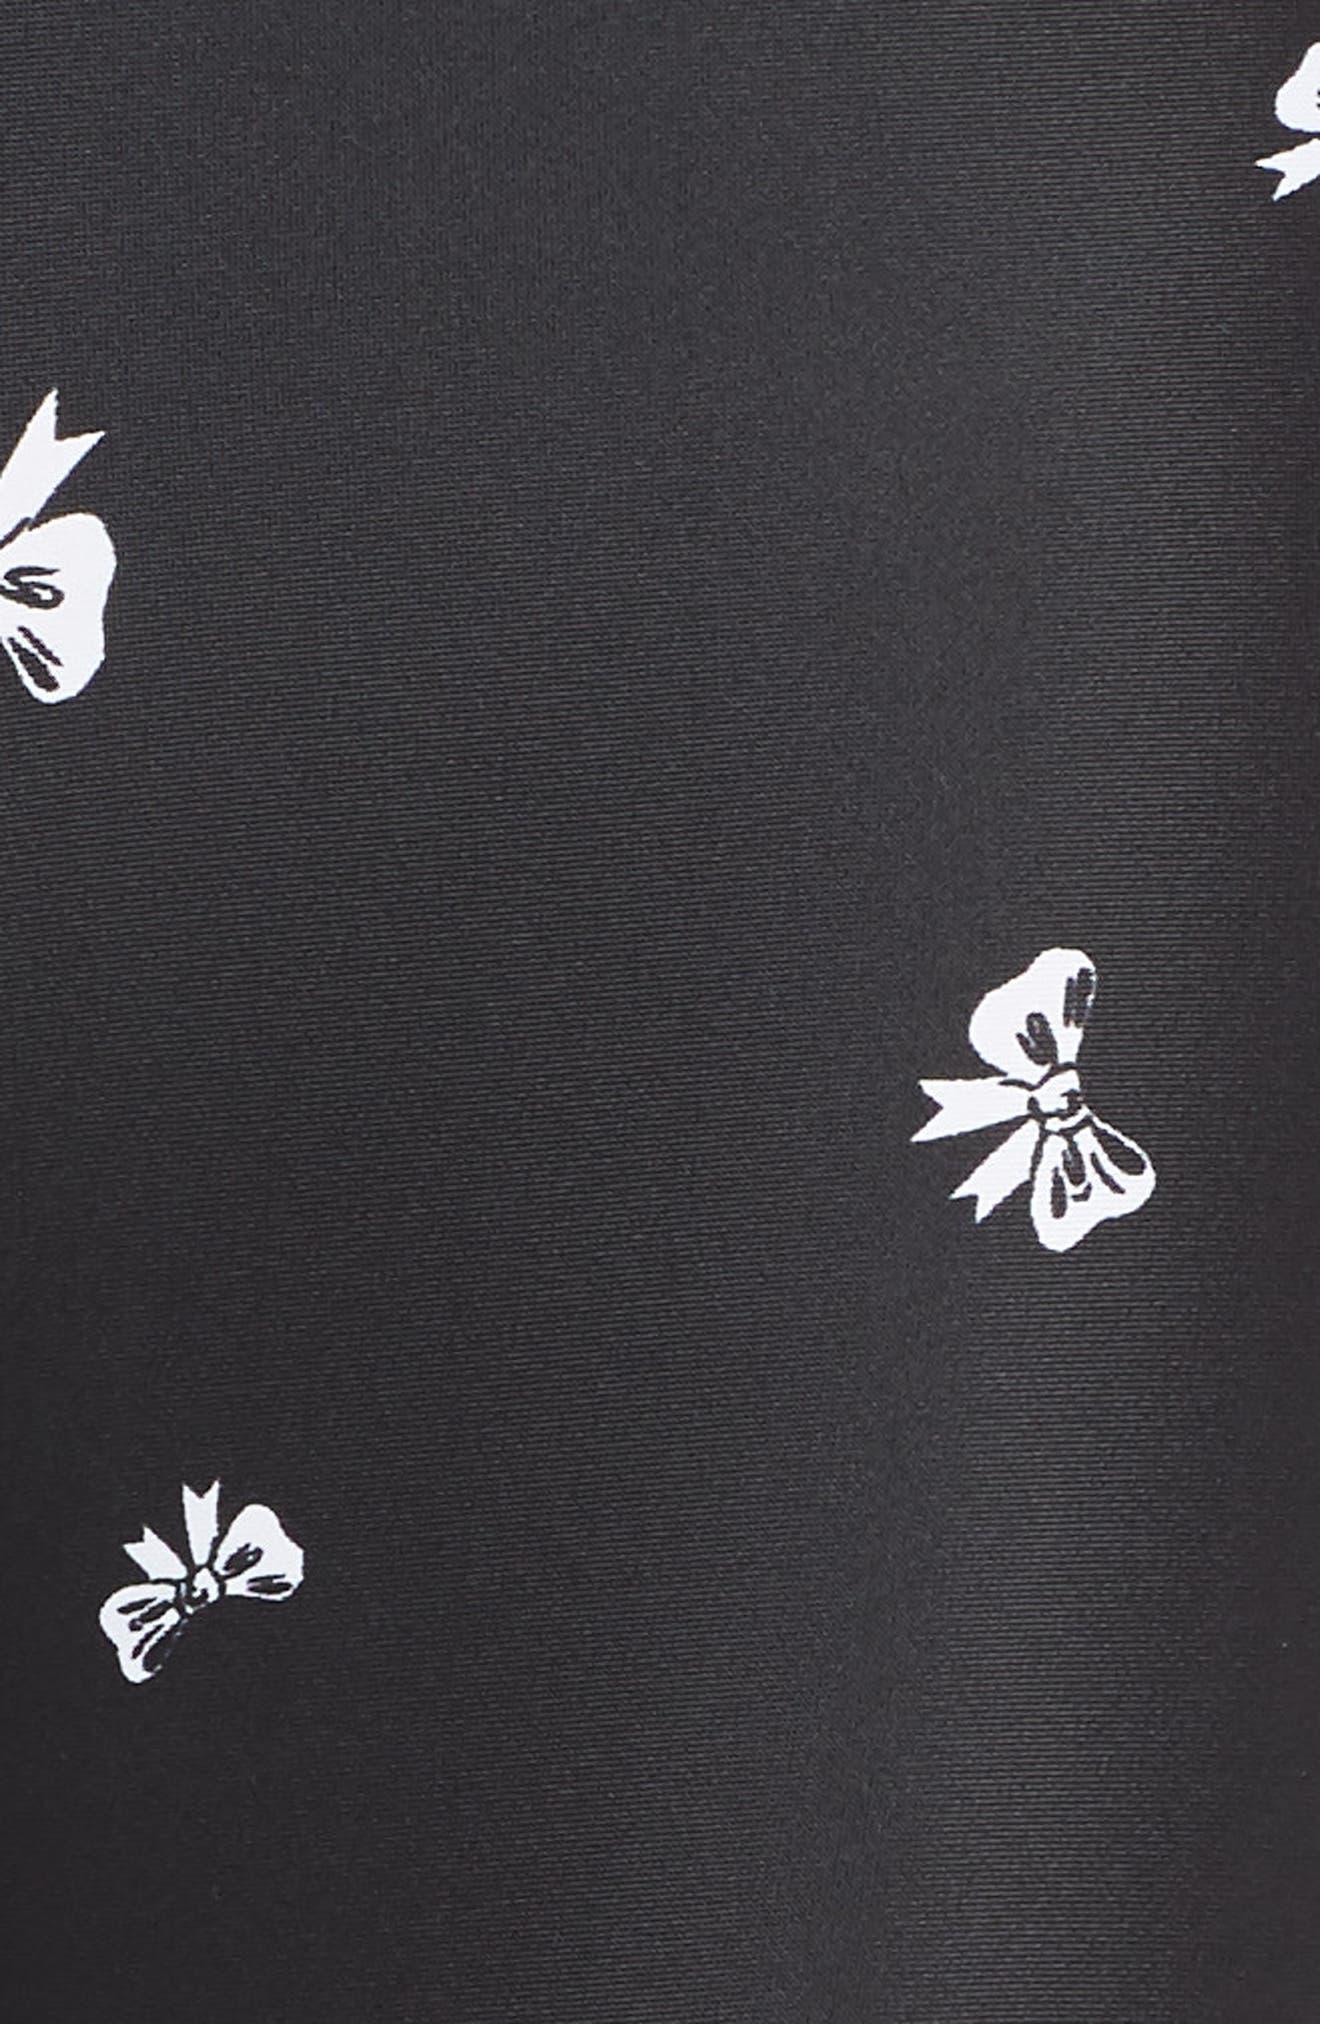 Bows Power Pant Crop Leggings,                             Alternate thumbnail 6, color,                             BLACK/ WHITE